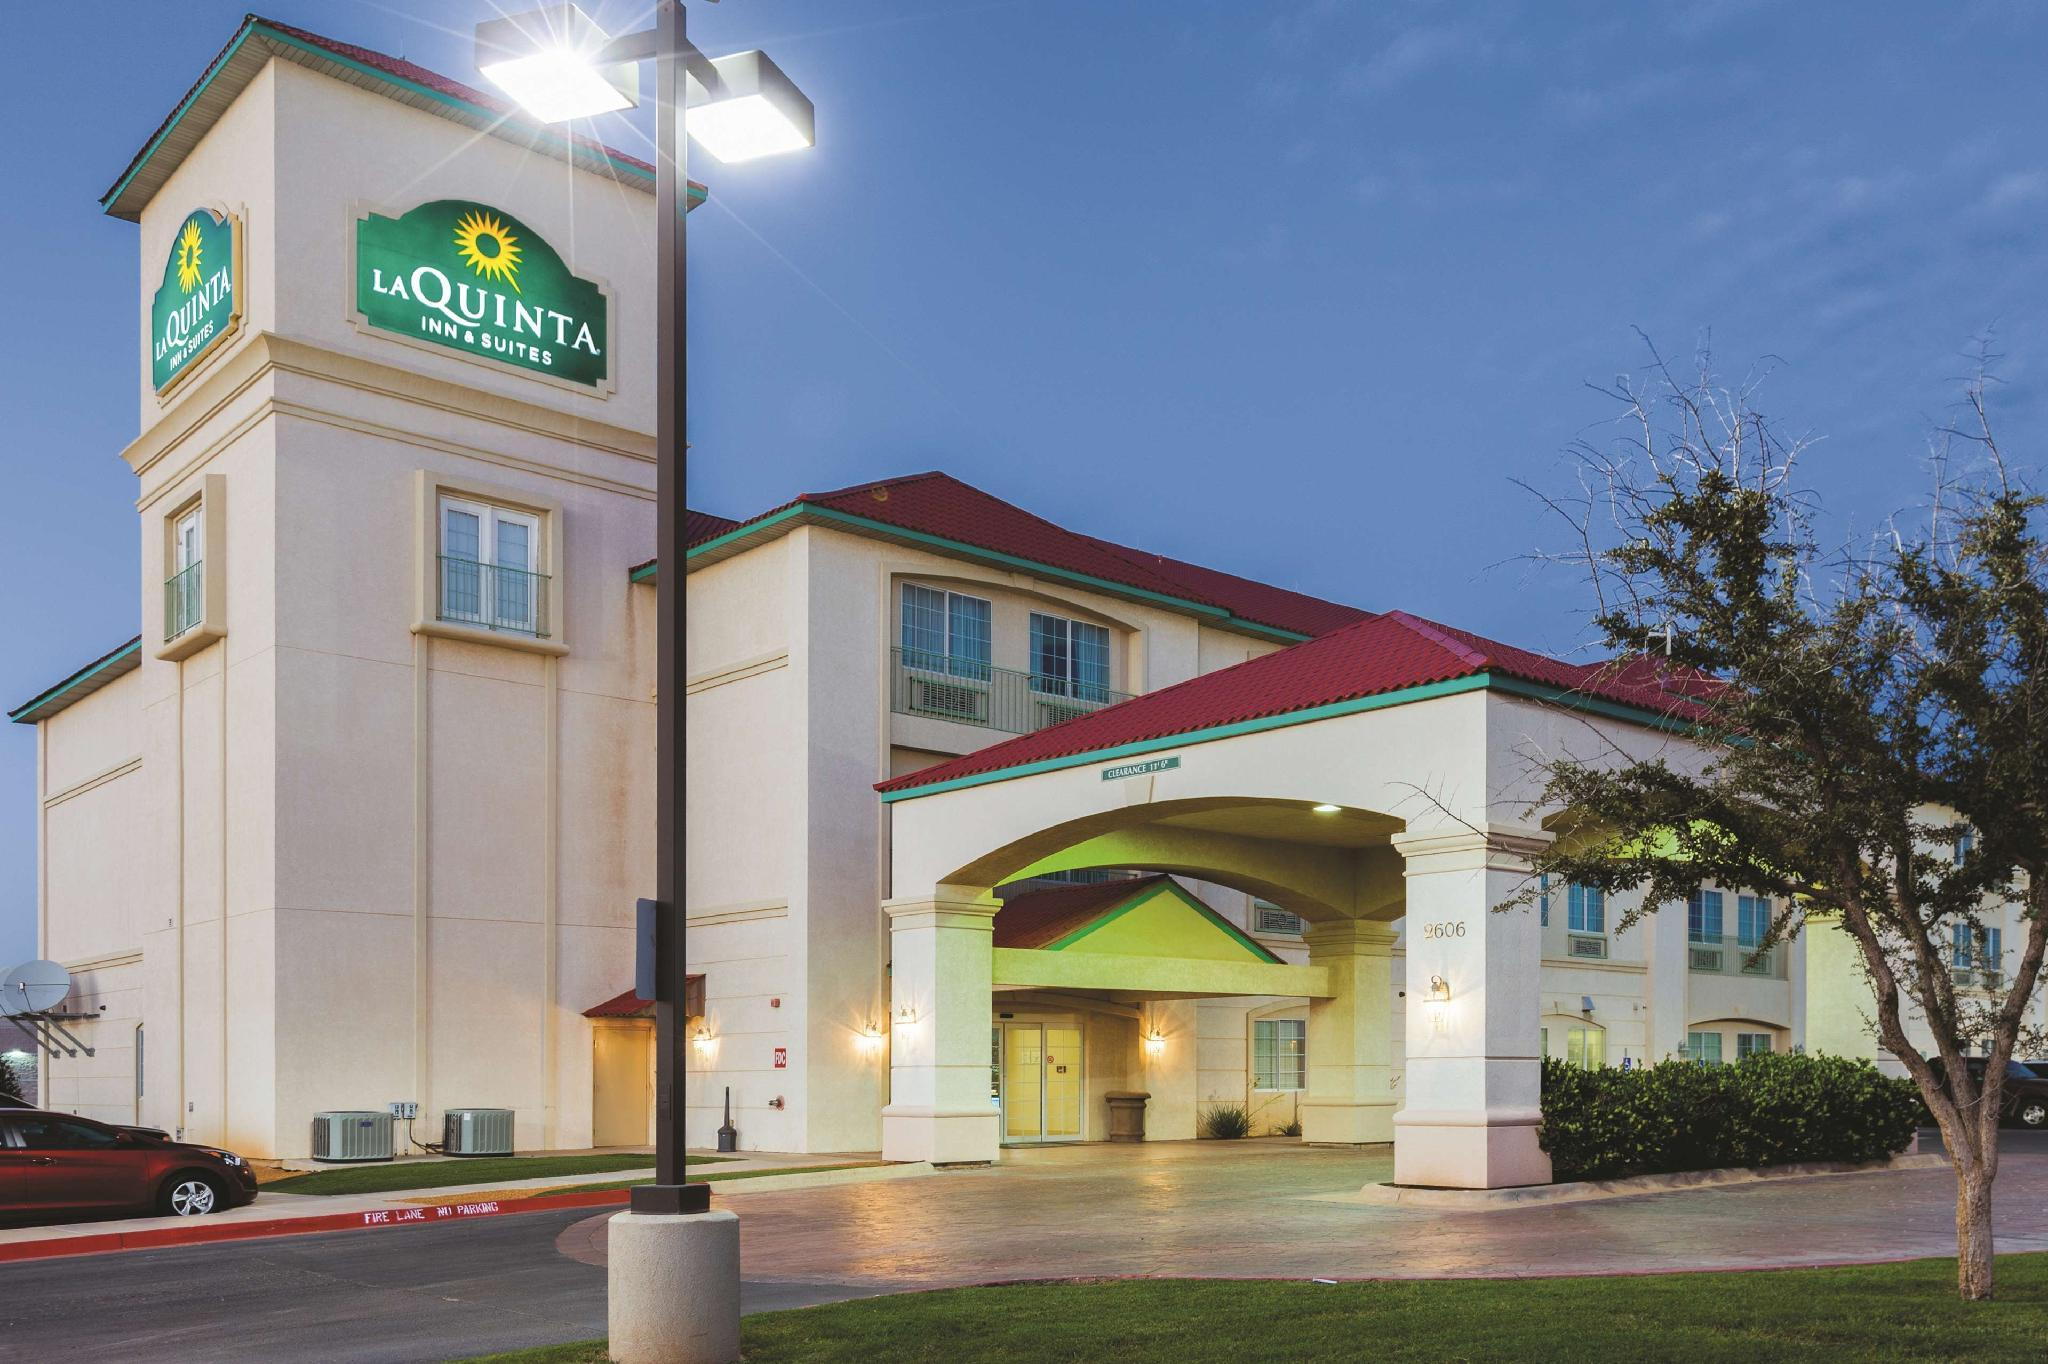 La Quinta Inn And Suites Midland North